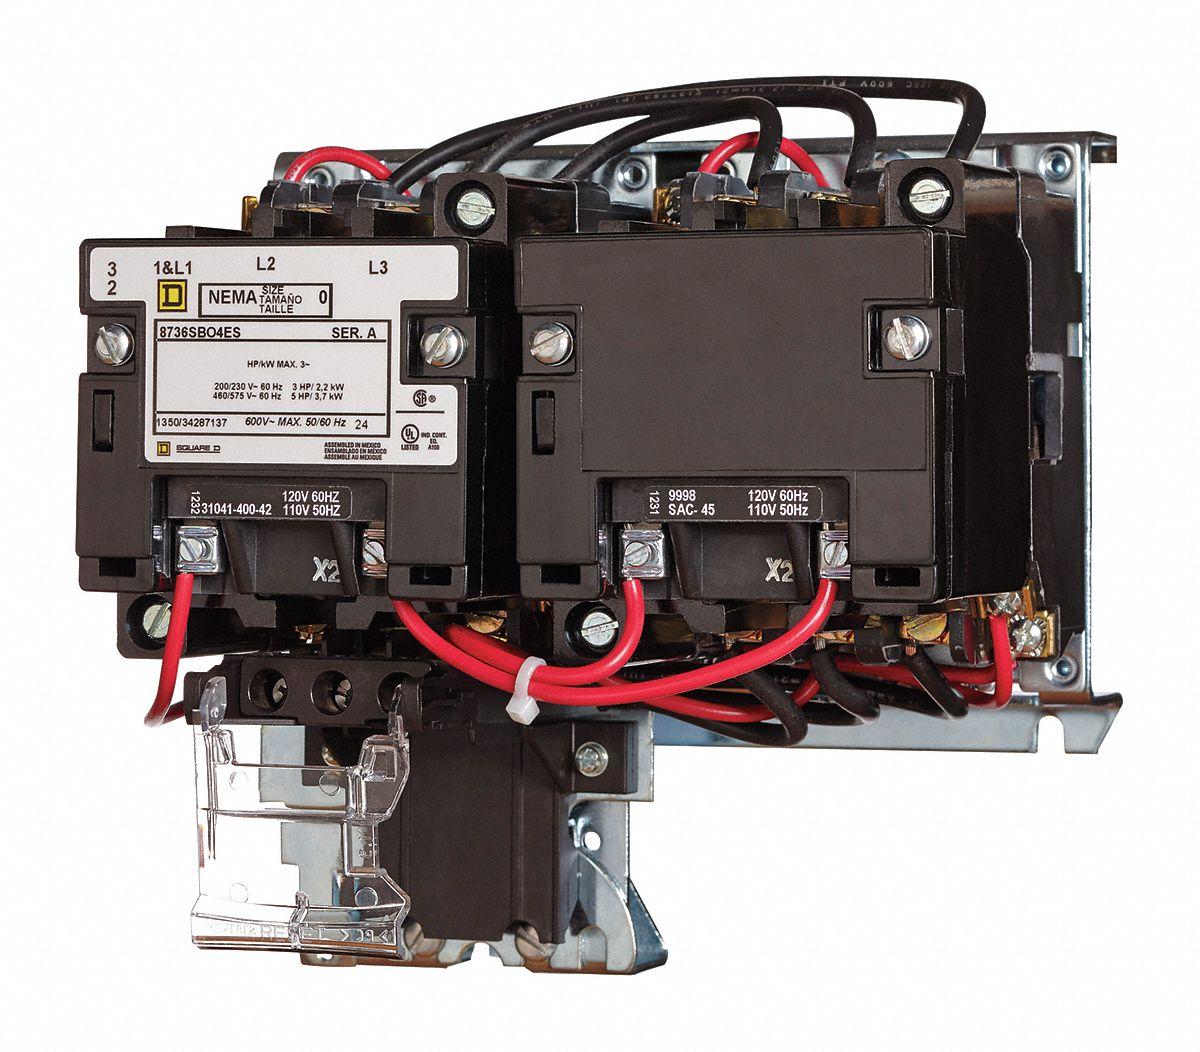 hight resolution of square d magnetic motor starter 240vac coil volts nema size 0 480 volt transformer wiring diagram wiring 480 200 hp motor